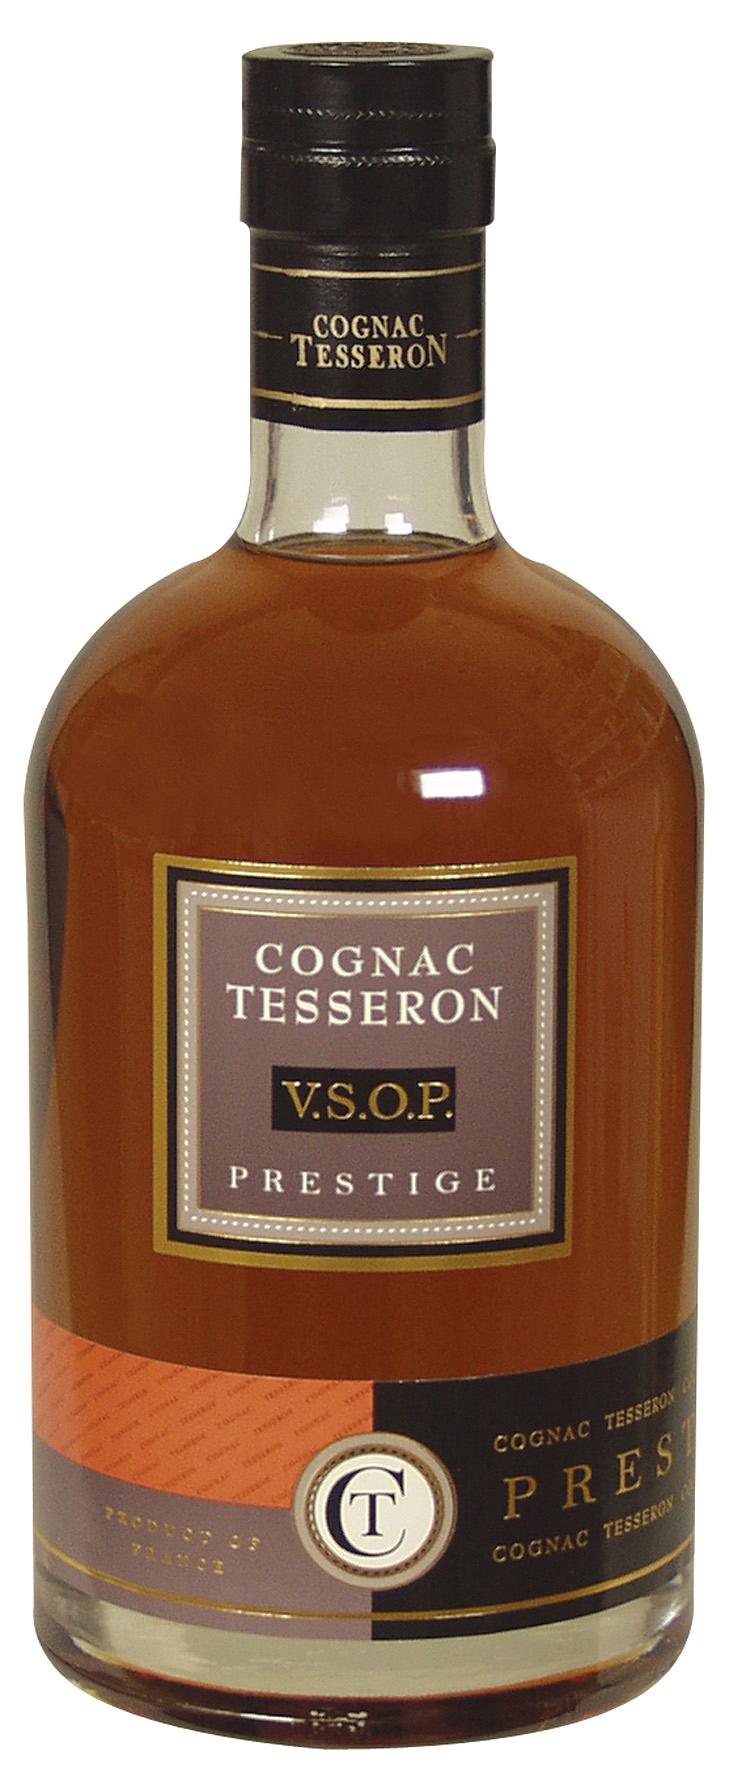 Reiseliv Tesseron 0910 Flaske.jpg